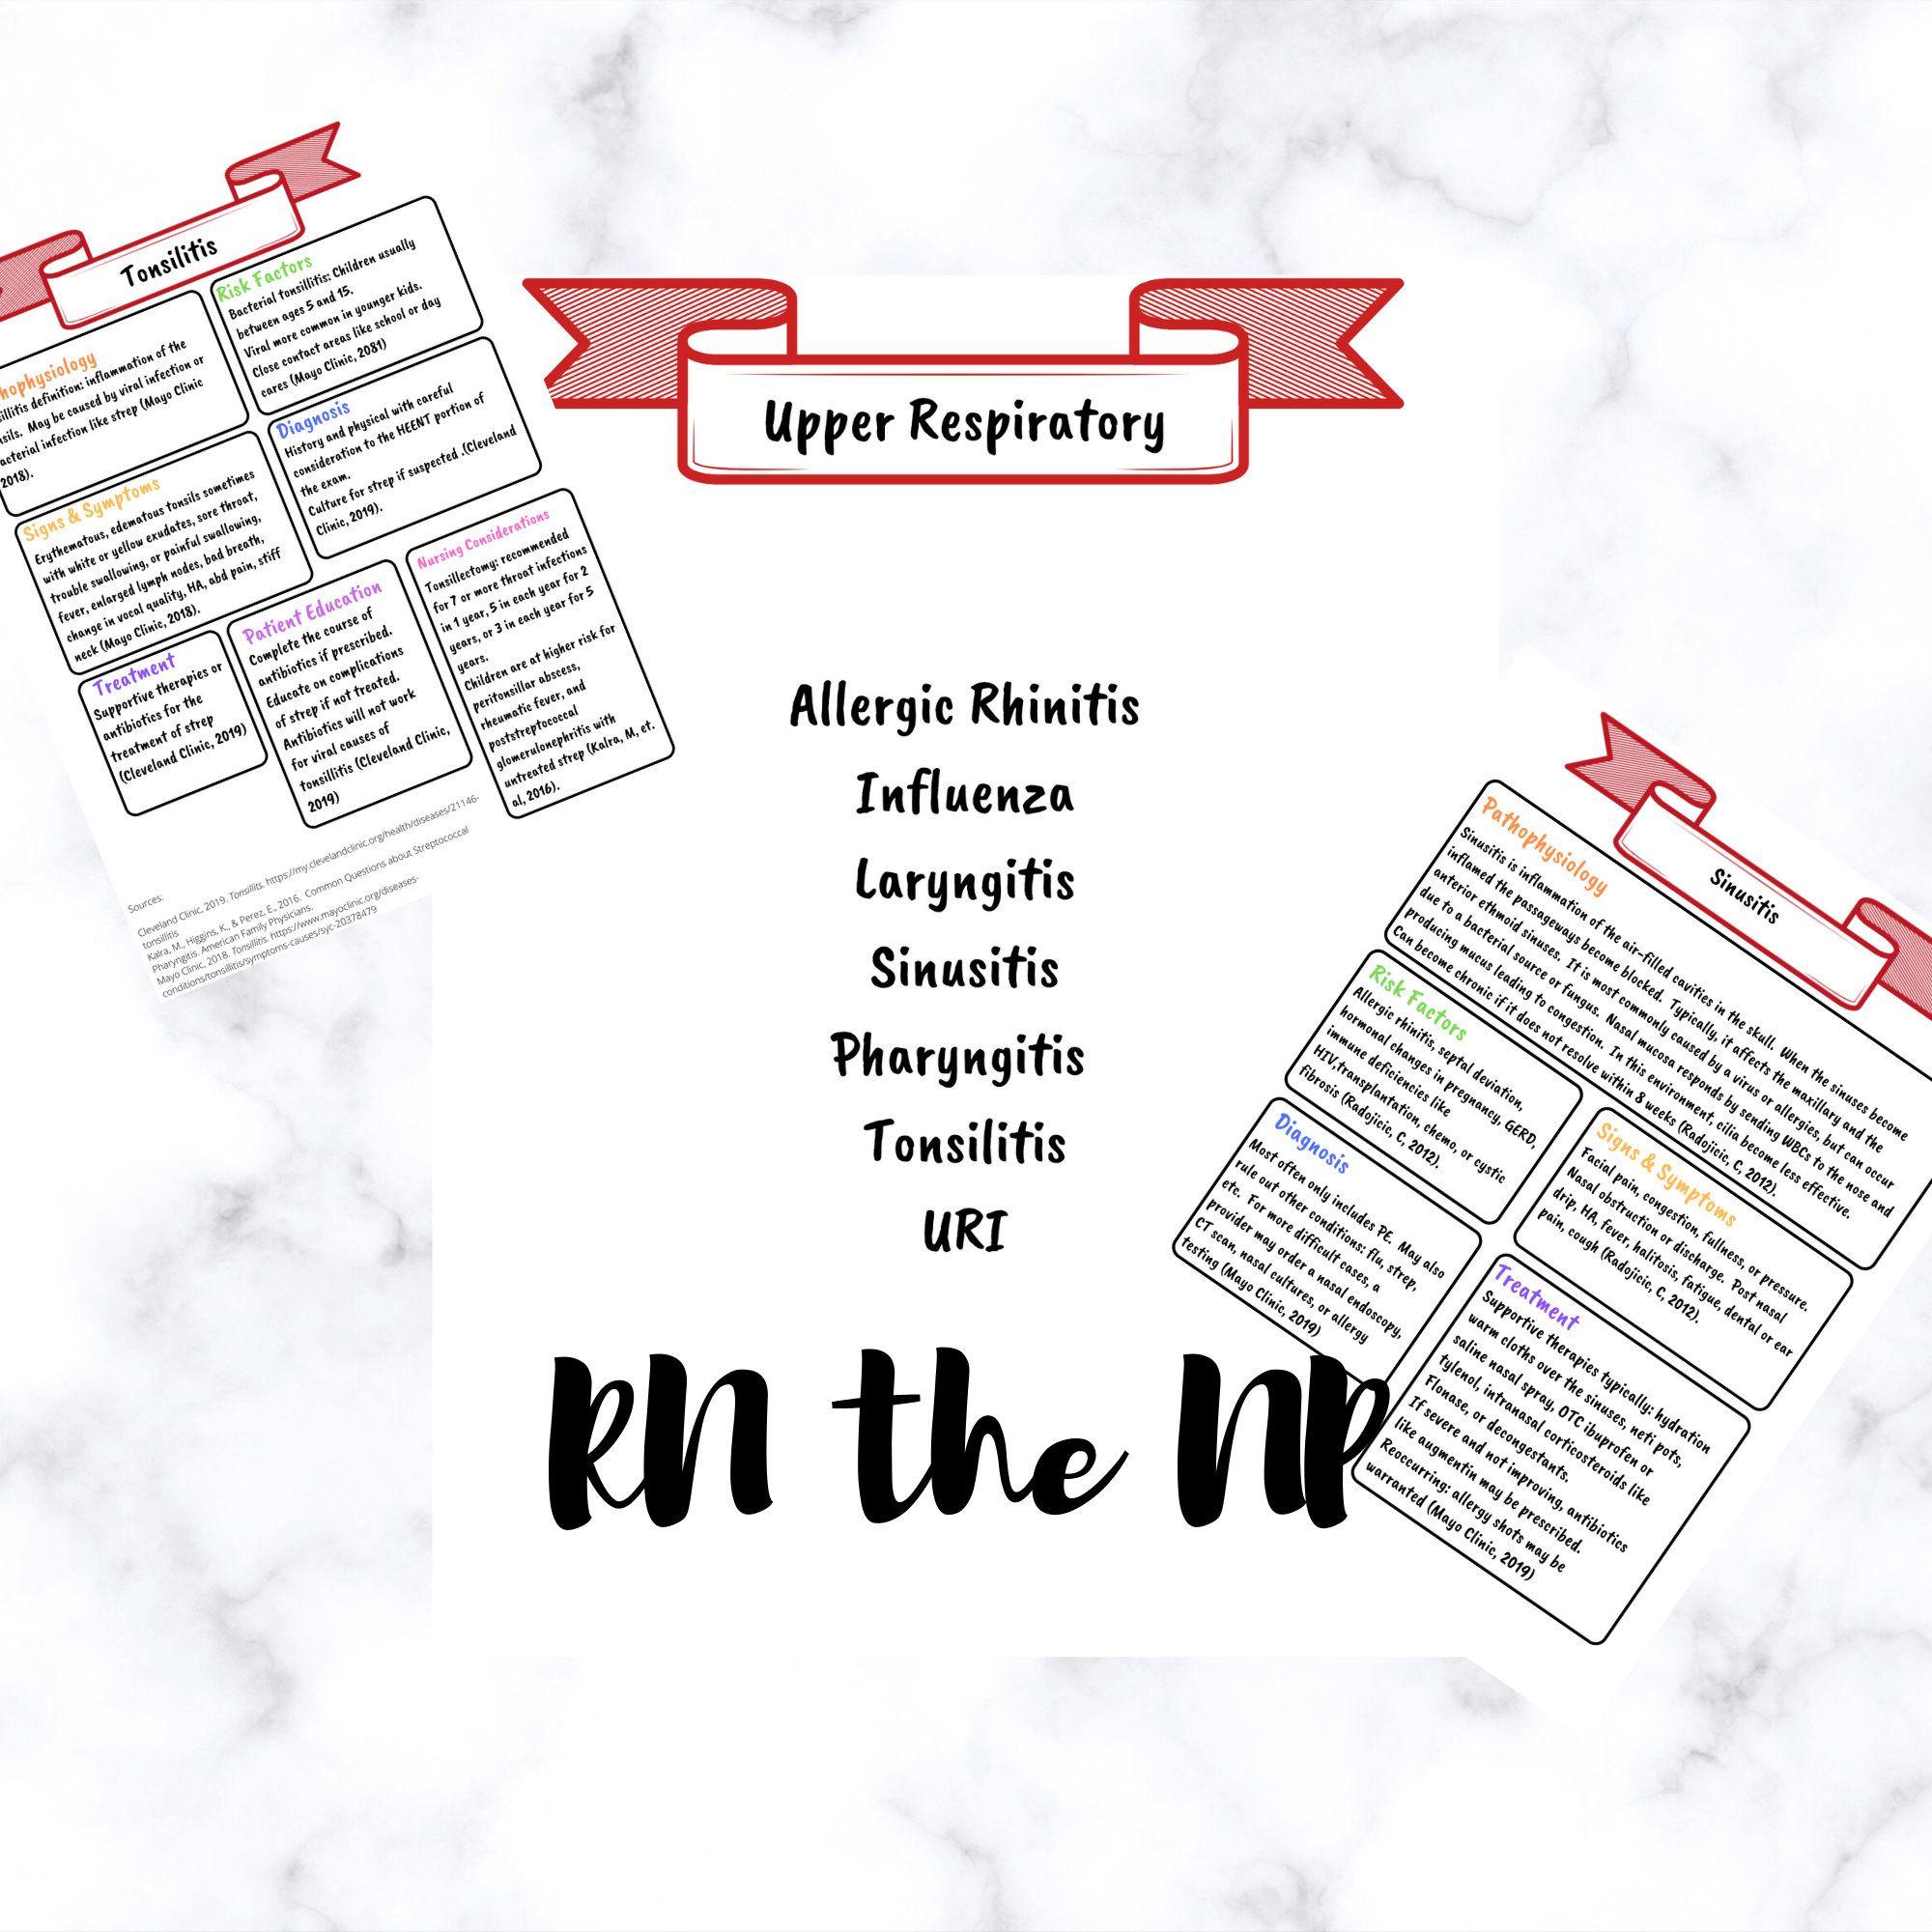 Upper Respiratory Bundle For Nursing Students By Rnthenp On Etsy Nursing Study Guide Nursing School Notes Nursing Students